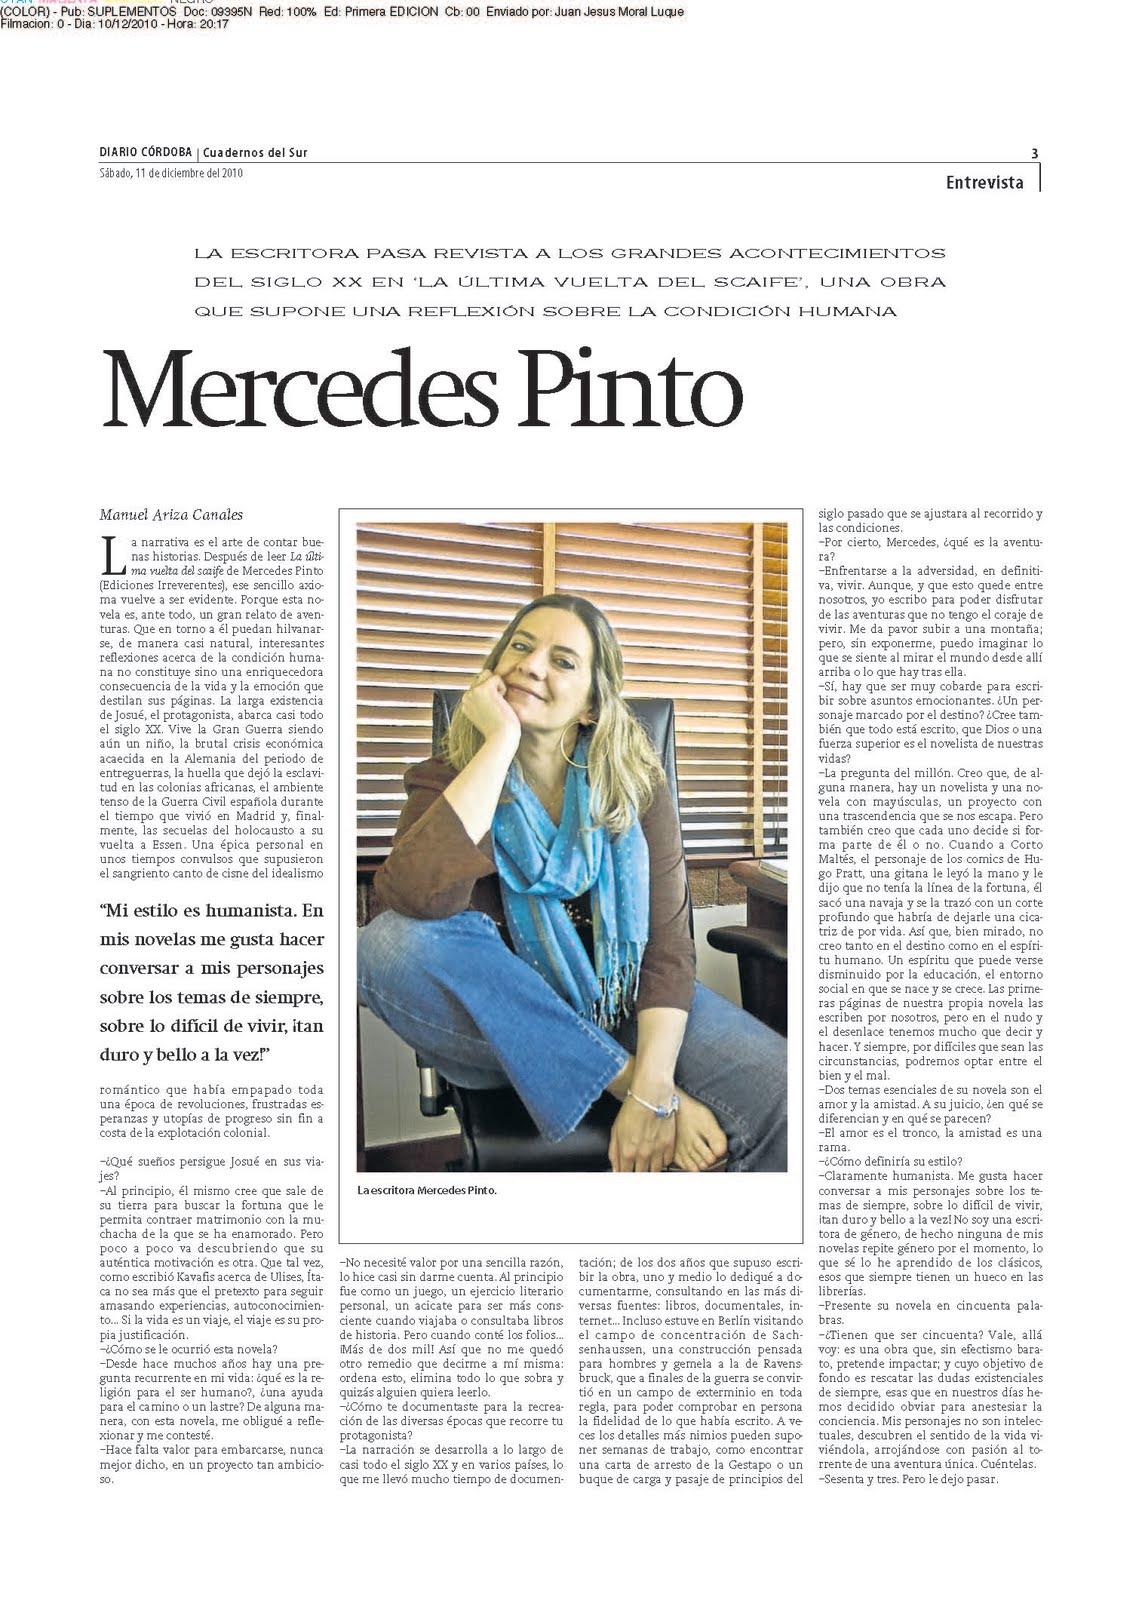 Entrevista_MERCEDES_PINTO_-_MANUEL_ARIZA_CANALES_(1)[1].jpg